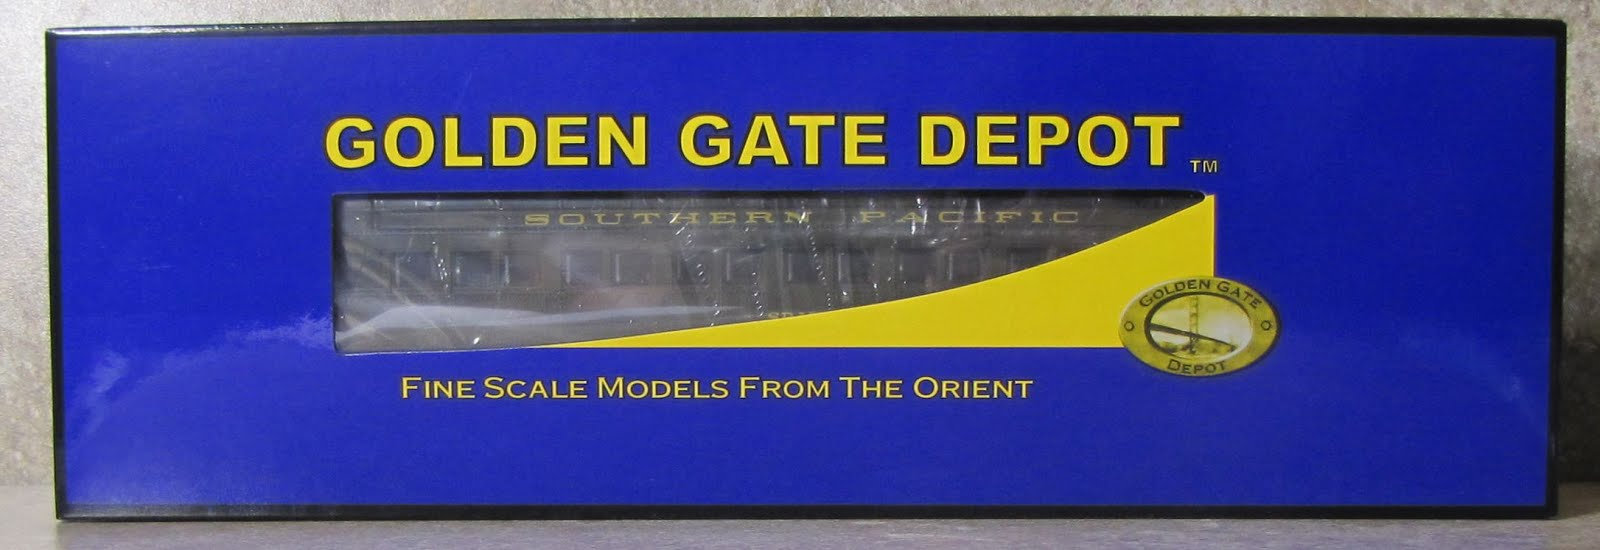 Prime Models And Kitbashes By Nightowlmodeler Review Golden Gate Depot Wiring Cloud Licukaidewilluminateatxorg